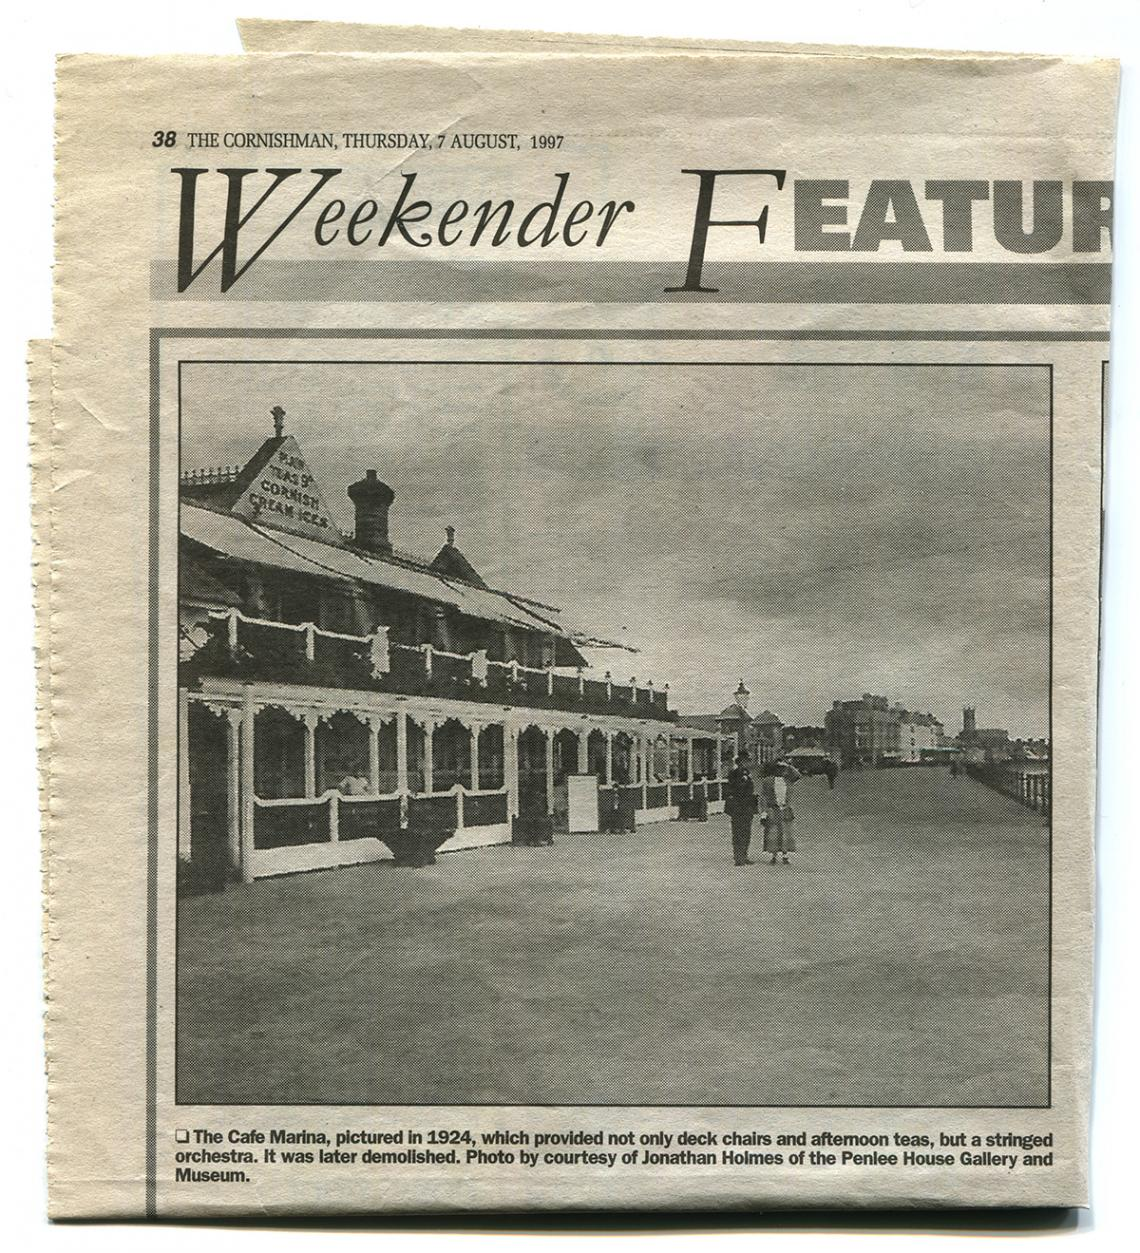 The Café Marina in 1924